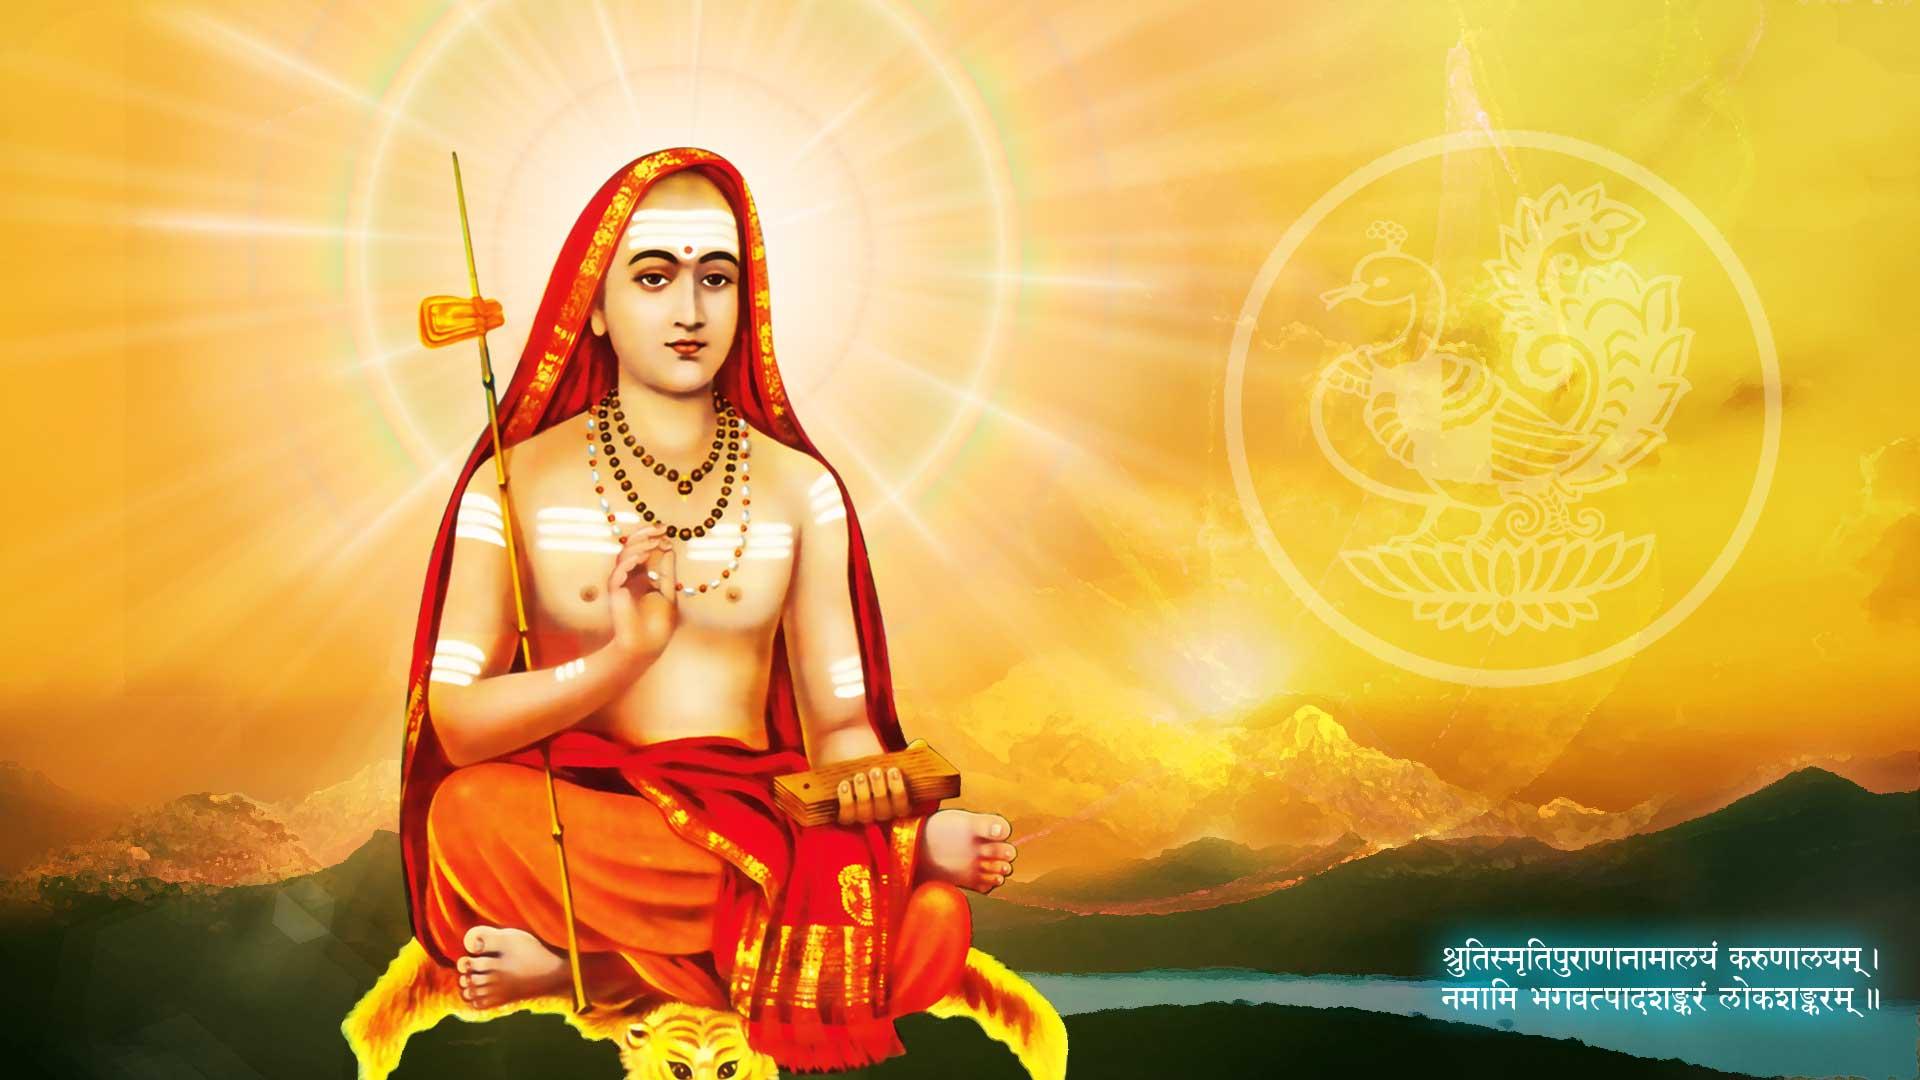 BHARAT DARSHAN -THREE GREAT TEACHERS OF INDIA: ADI SHANKARACHARYA(c.788 - c.820), EXPONENT OF 'ADVAITA' OR NON-DUALISM. MAN EXISTS ON EARTH UNDER POWERFUL INFLUENCE CALLED MAYA OR GRAND ILLUSION.